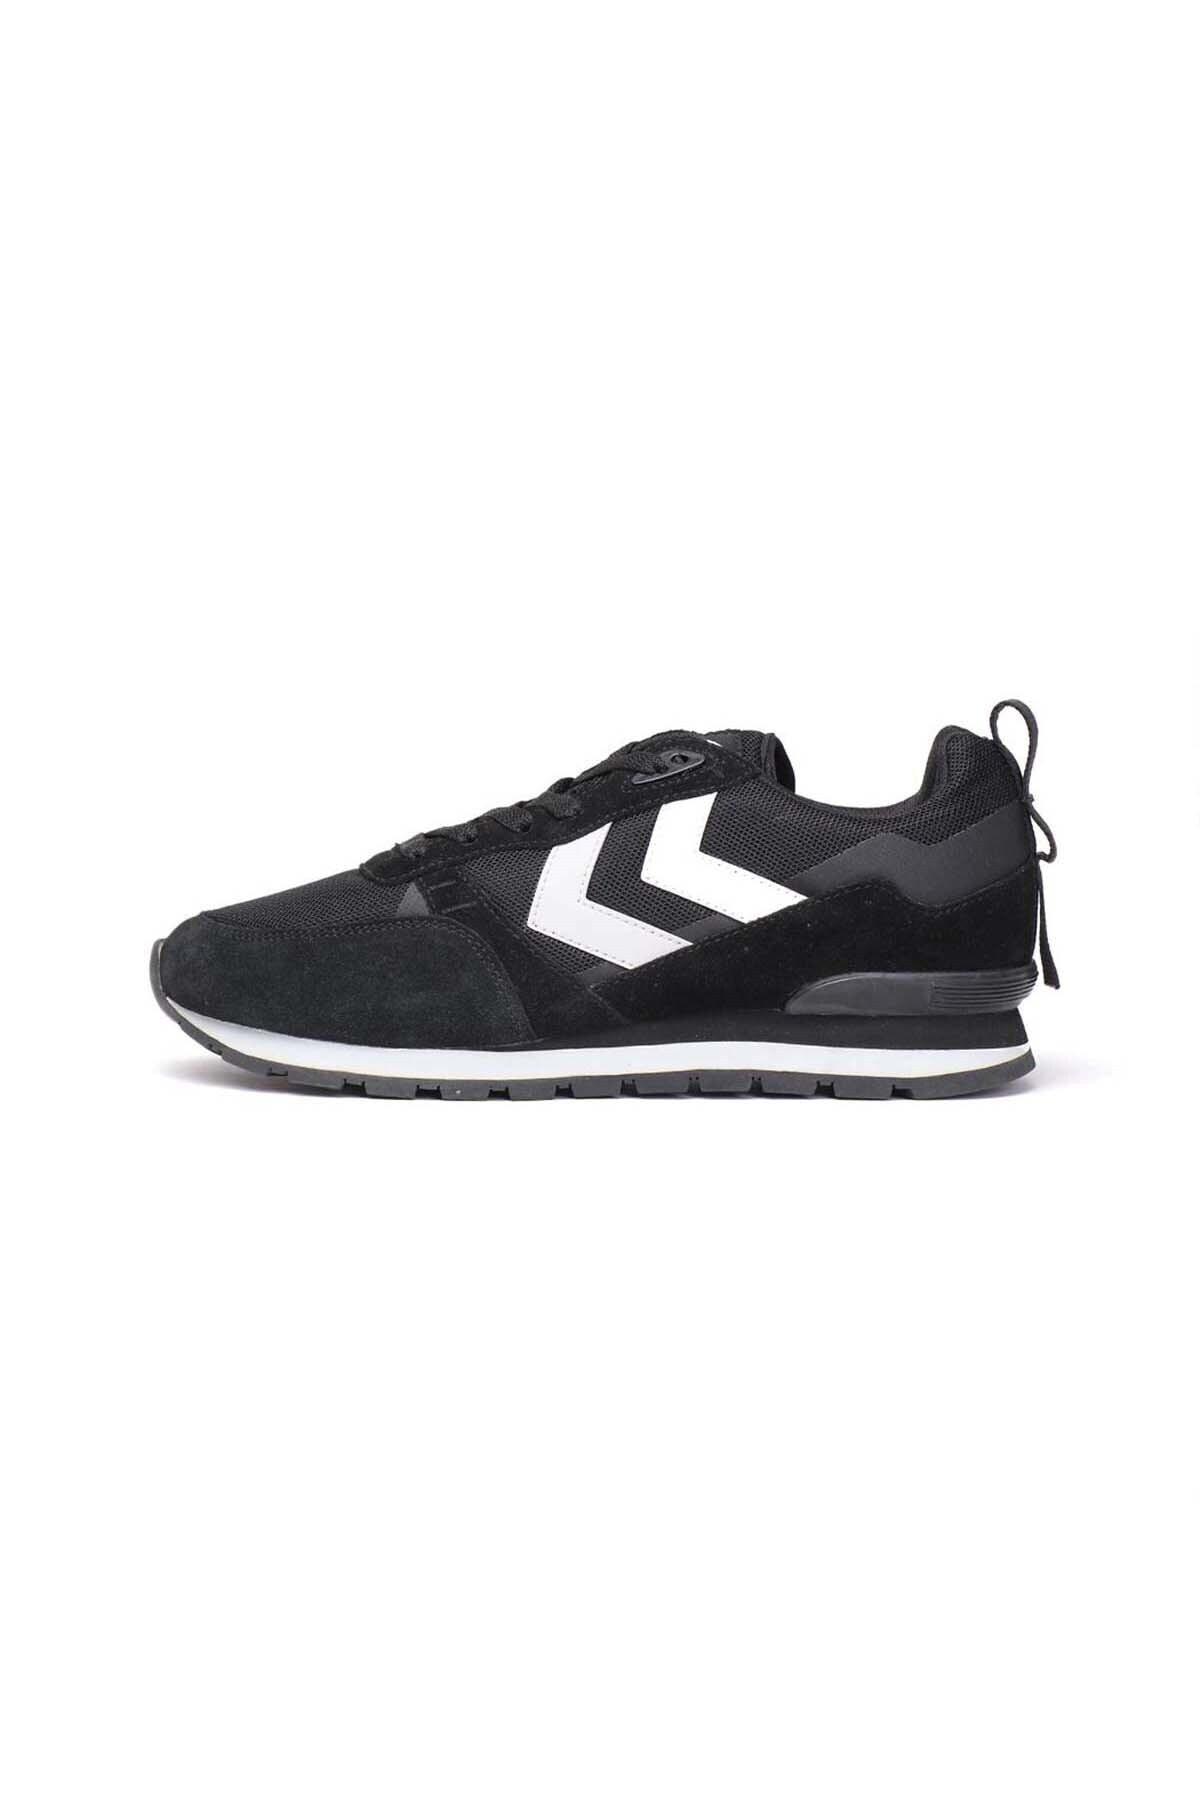 HUMMEL HML THOR Siyah Erkek Sneaker Ayakkabı 101085934 1